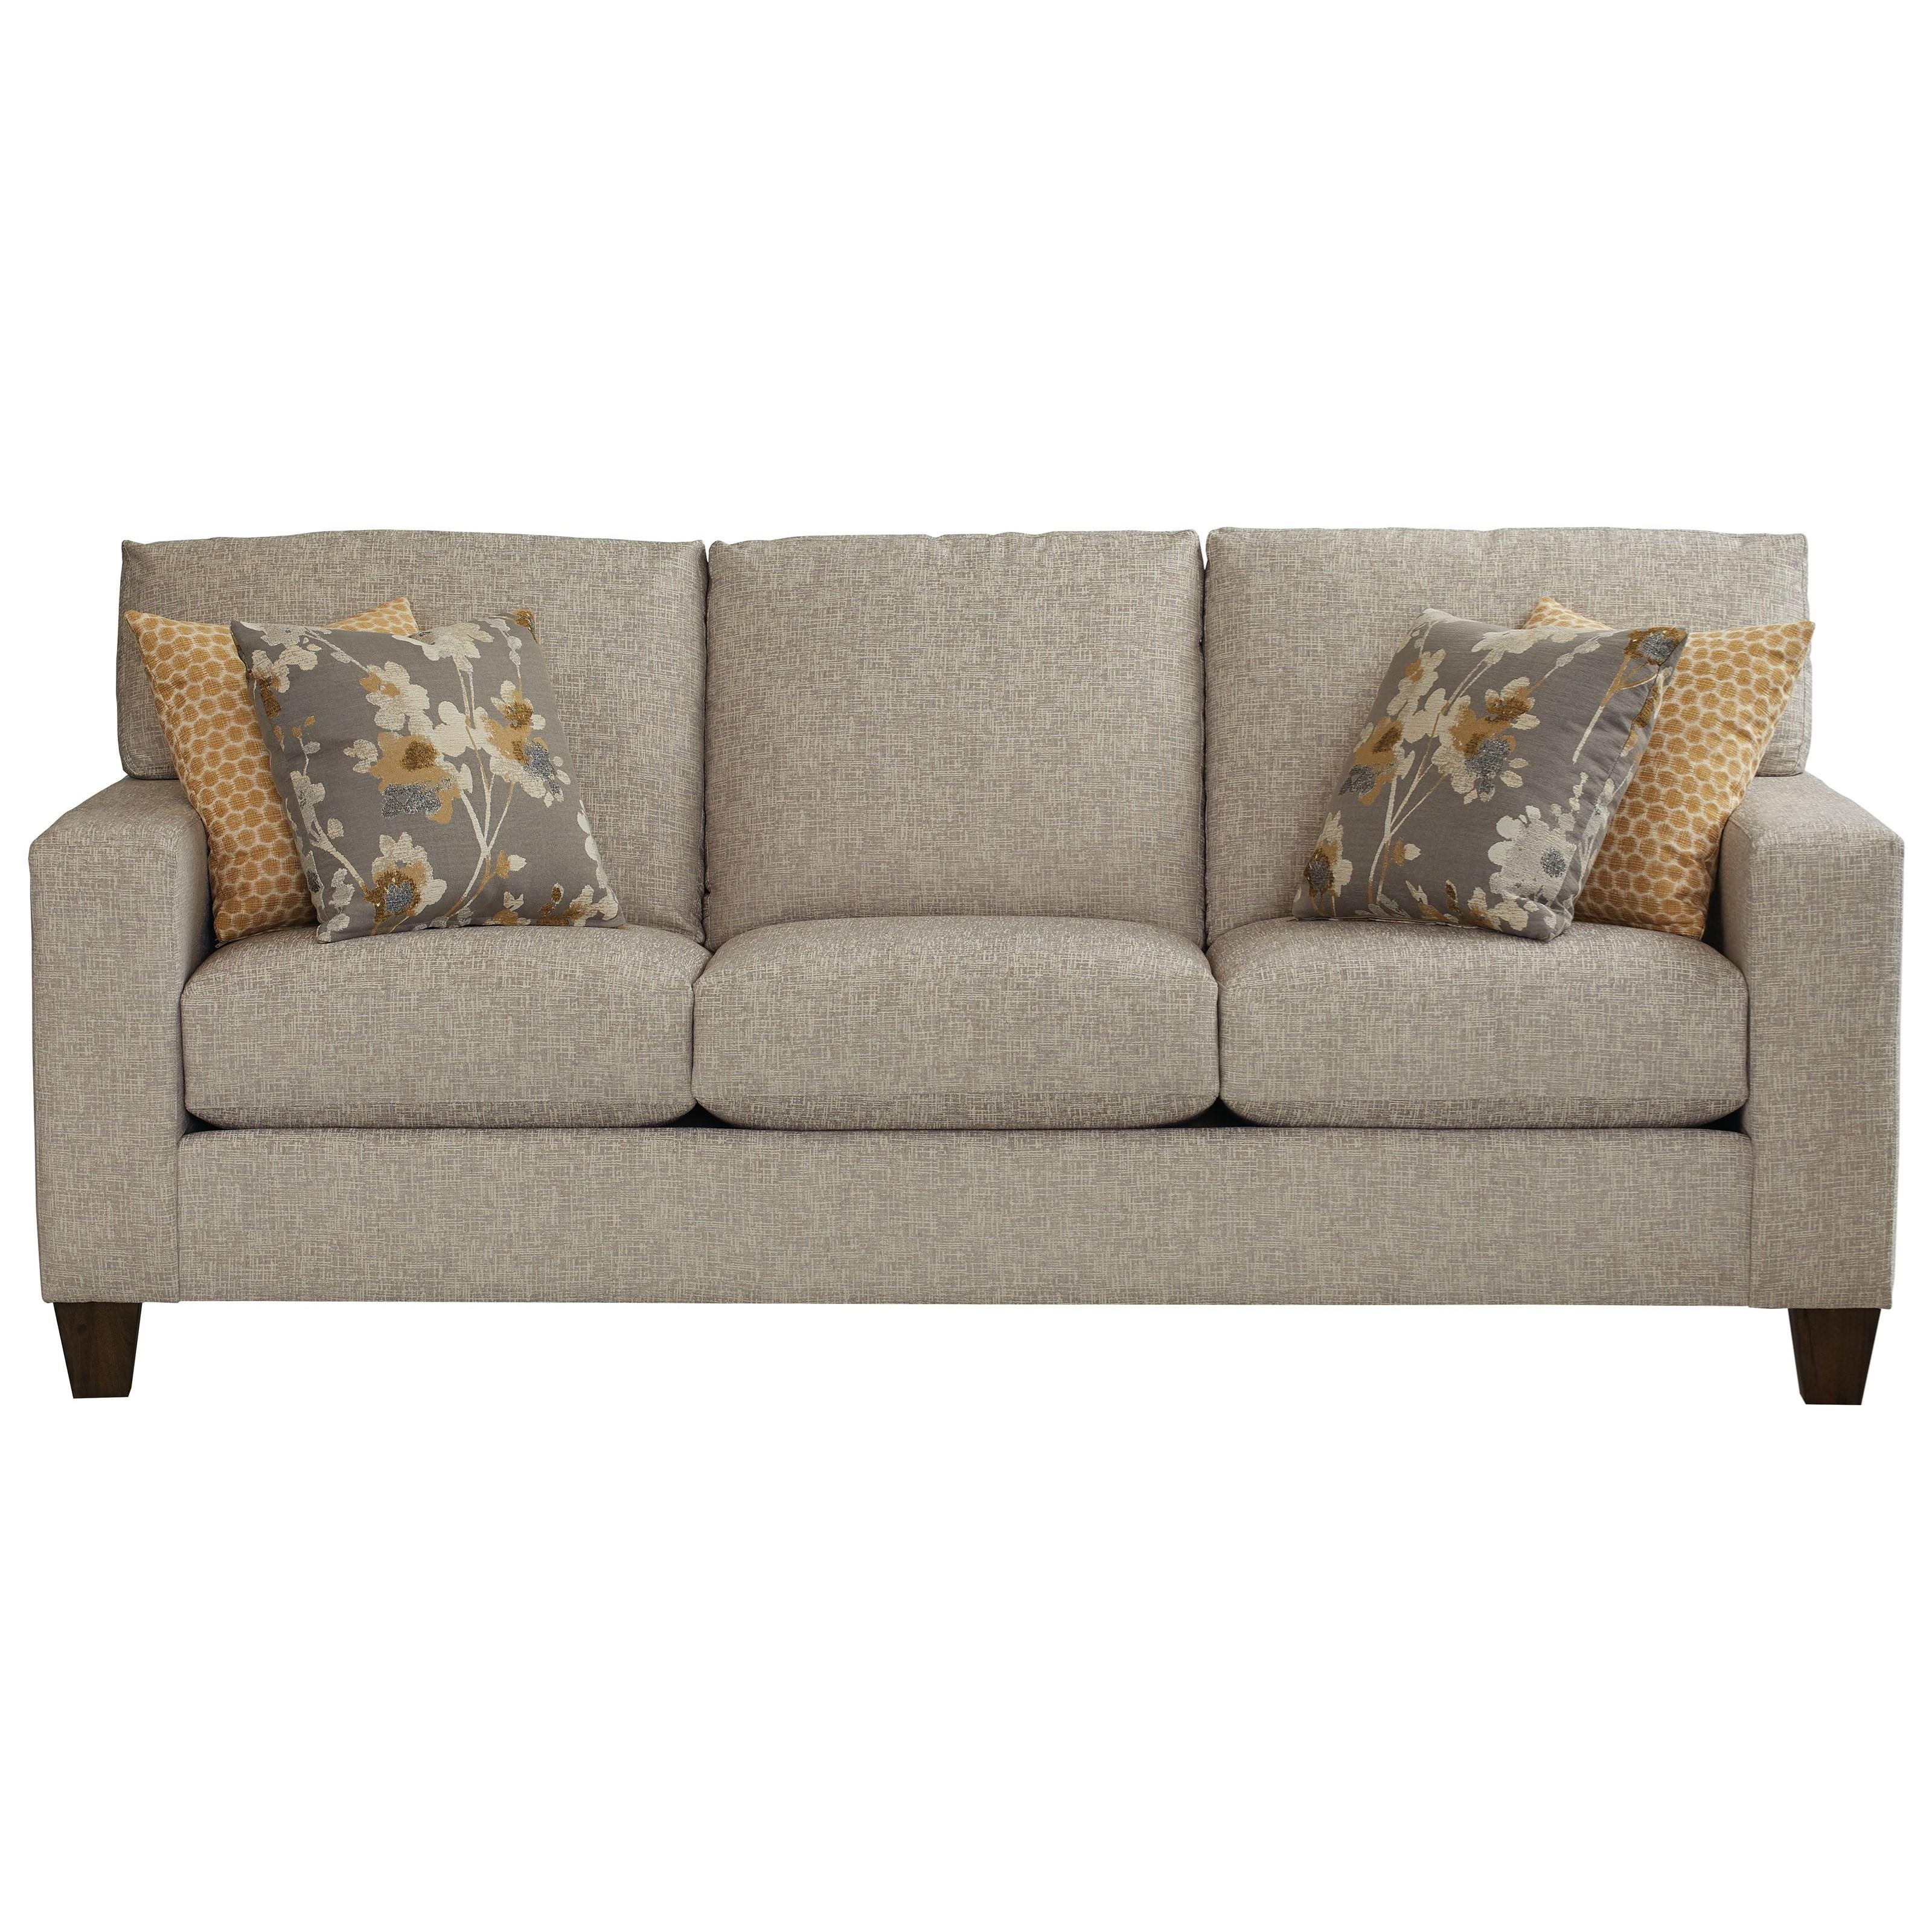 Tate Sofa by Bassett at Bassett of Cool Springs